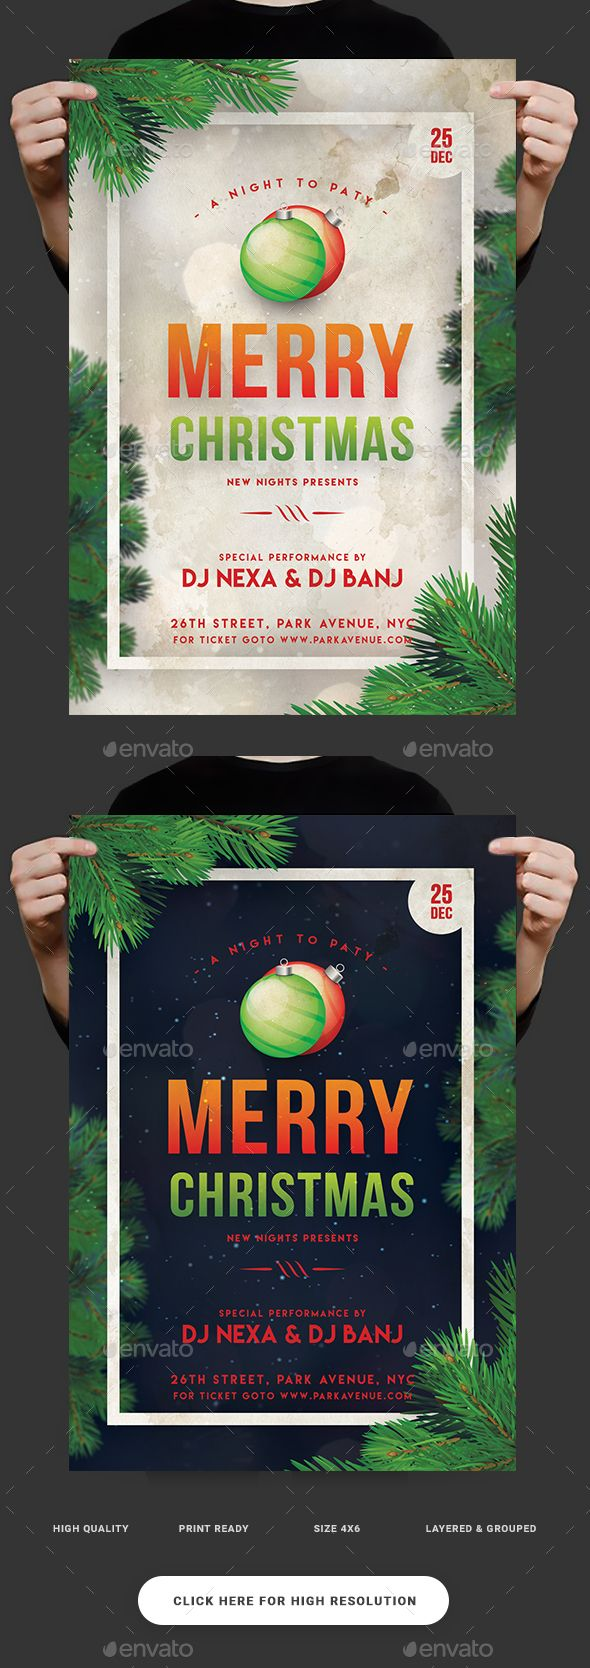 Christmas Flyer Template PSD #xmas